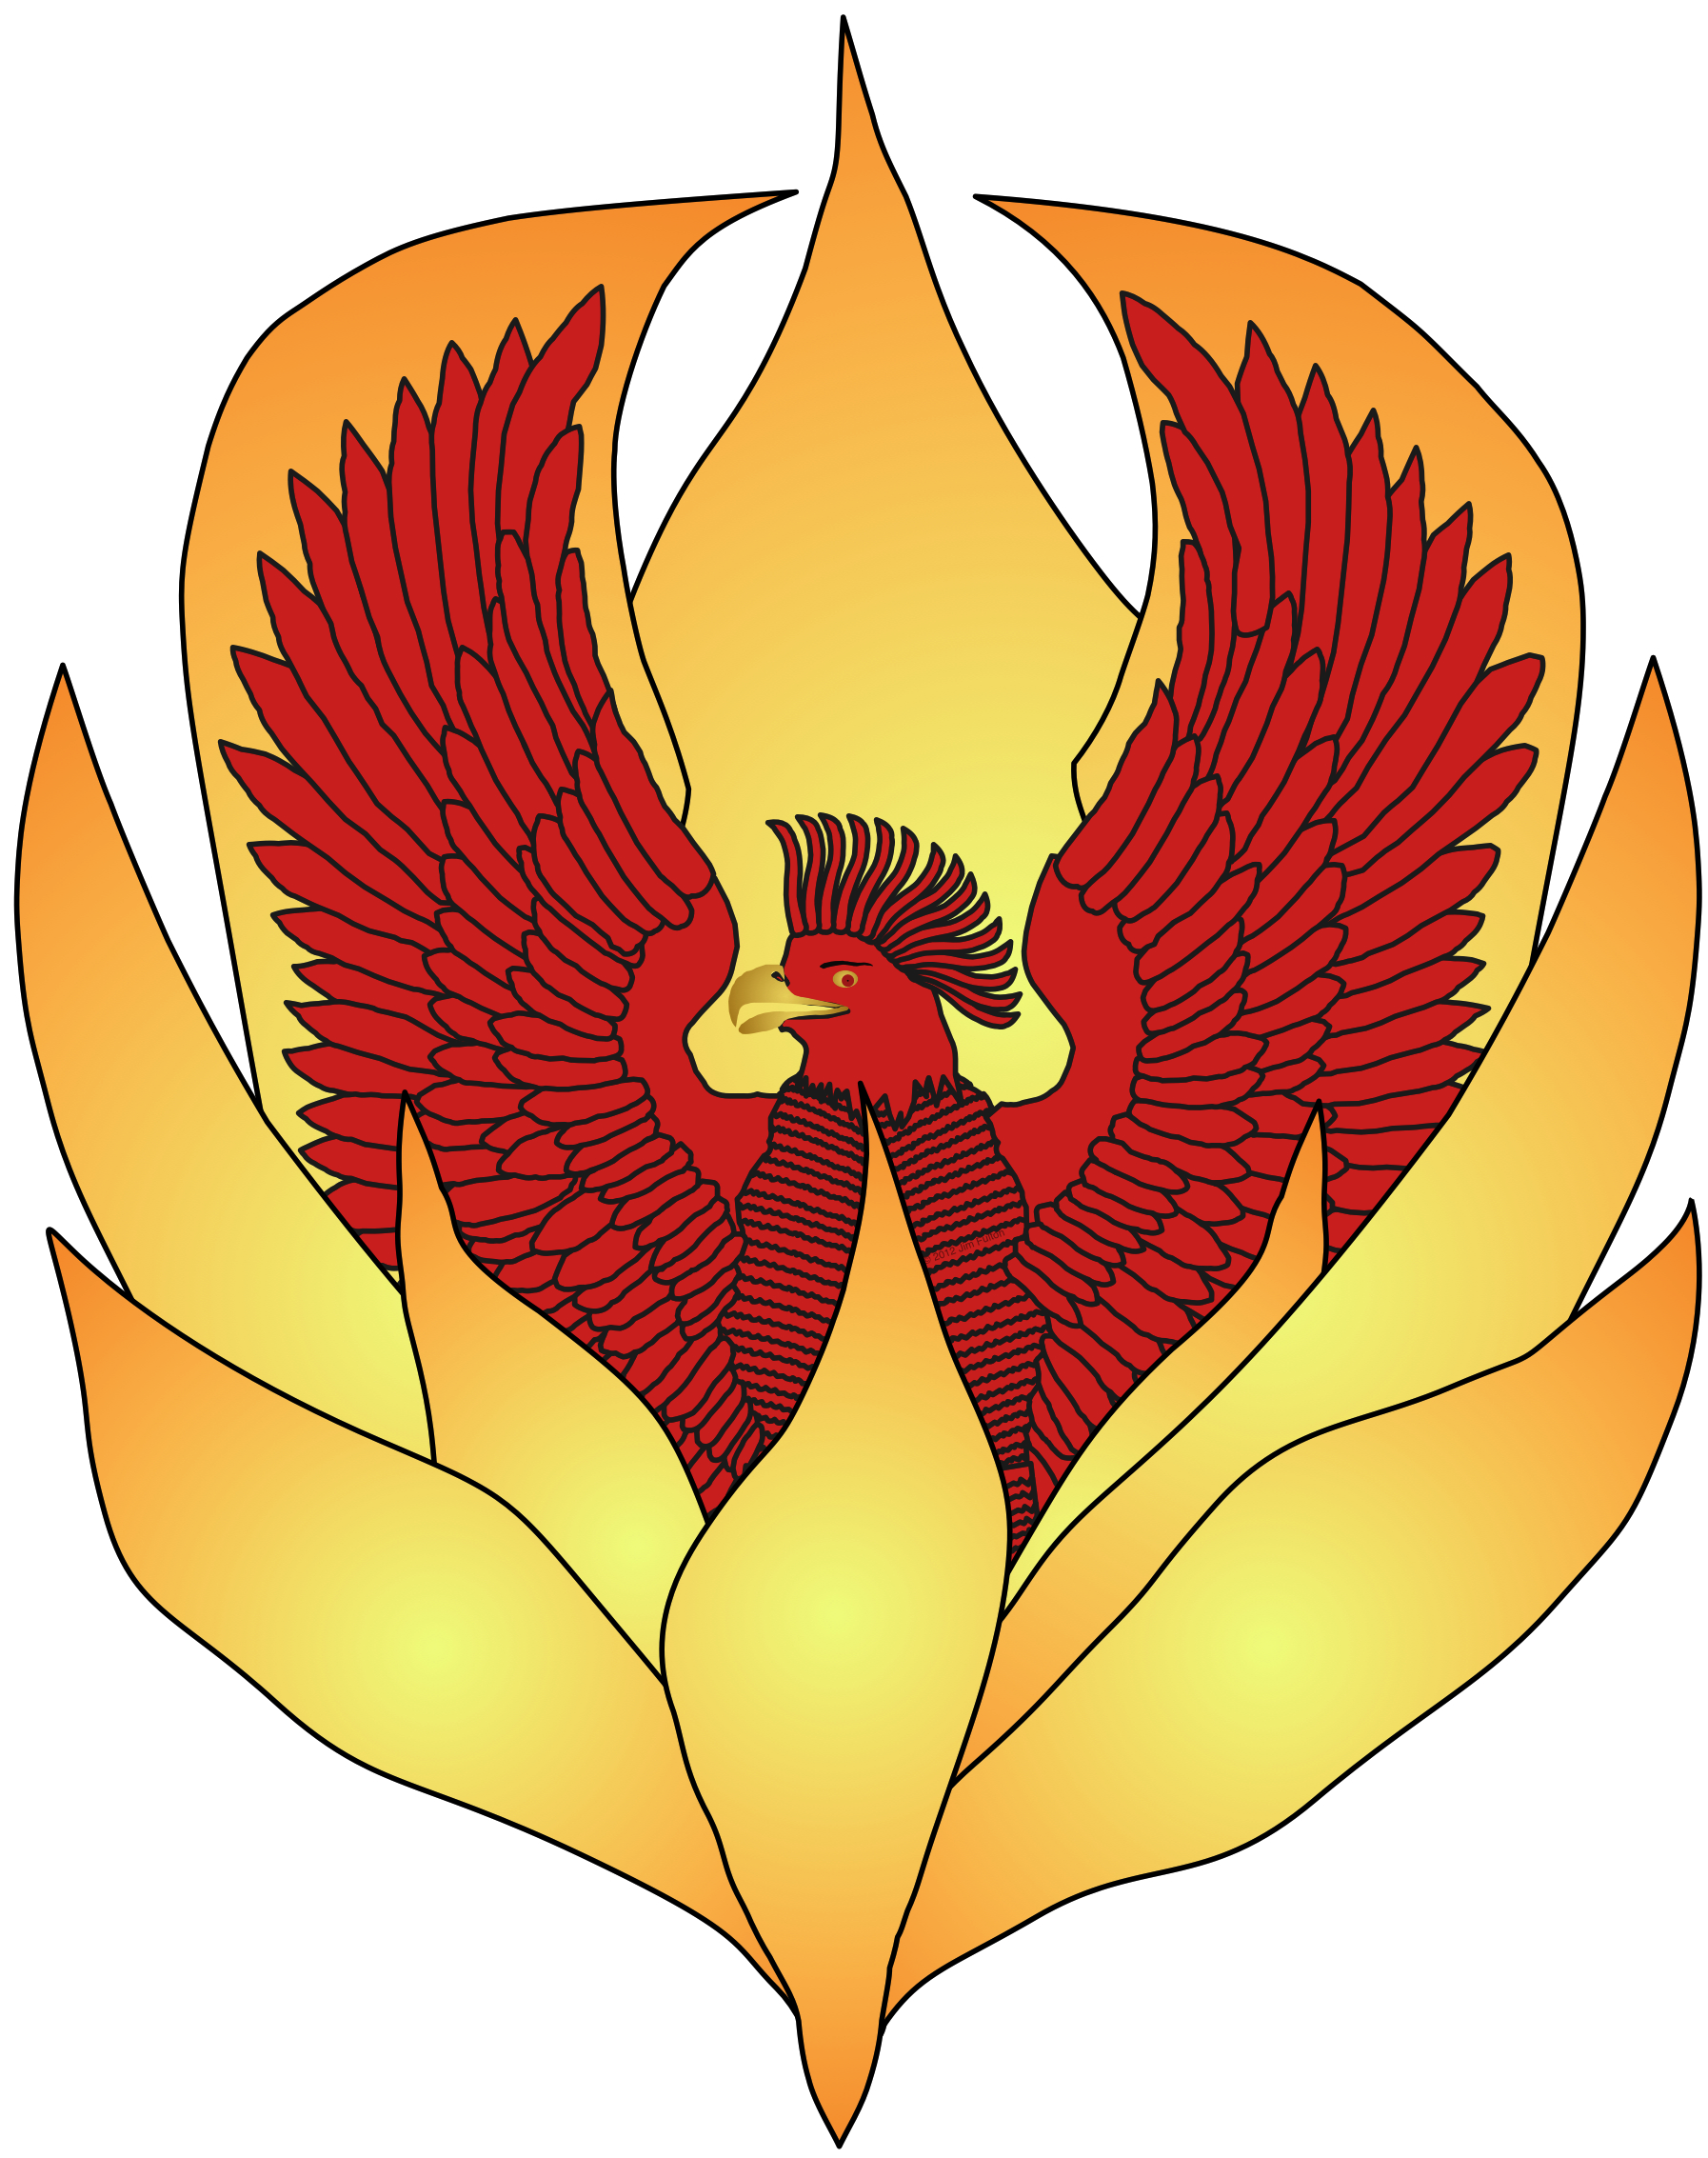 Myths of the. Phoenix clipart arabian